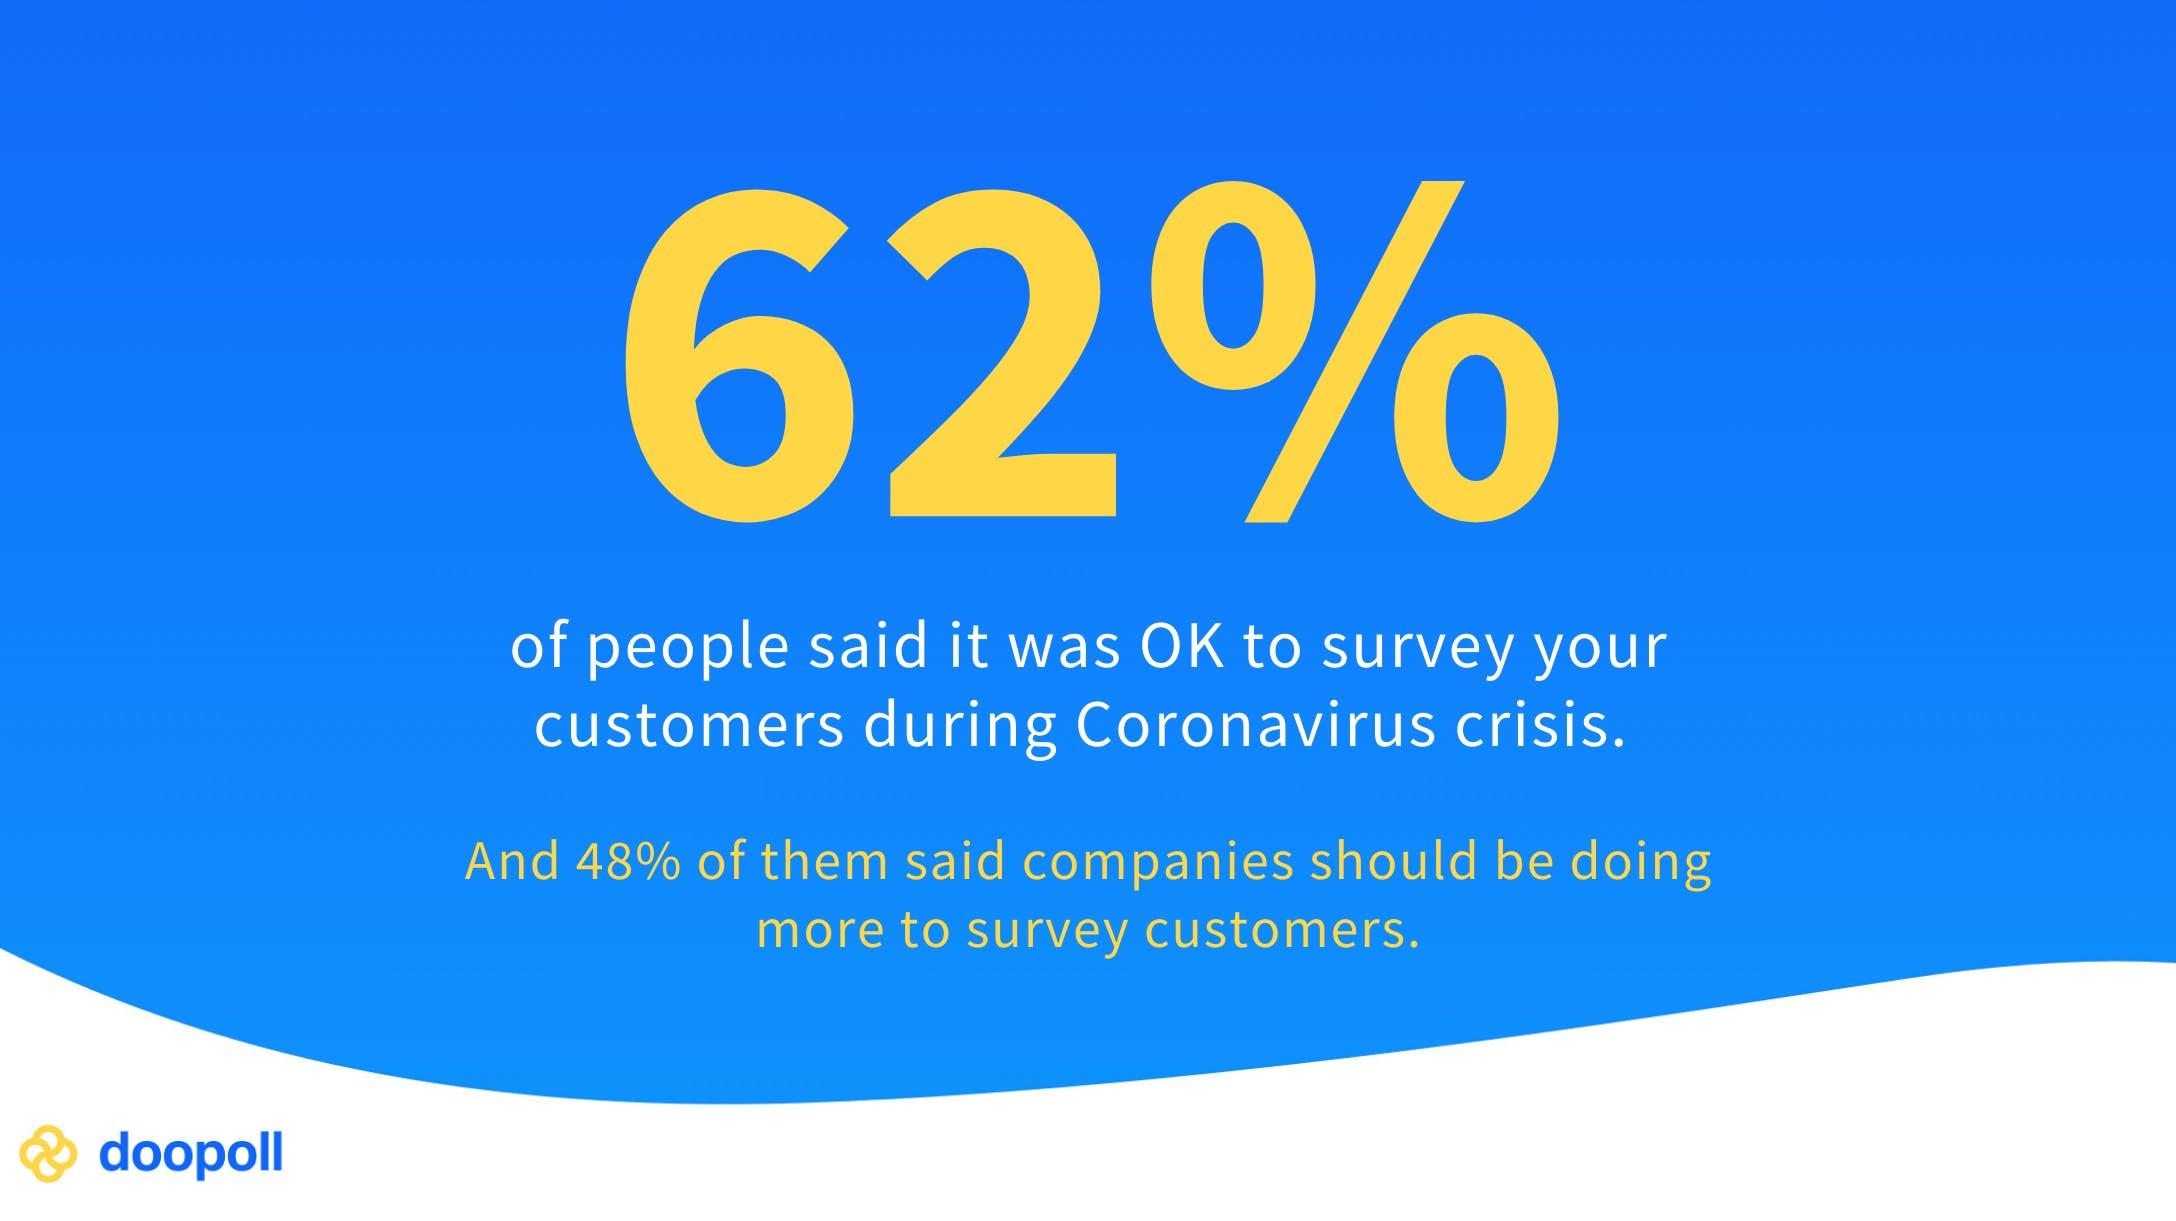 62% think it's OK to survey customers during Coronavirus